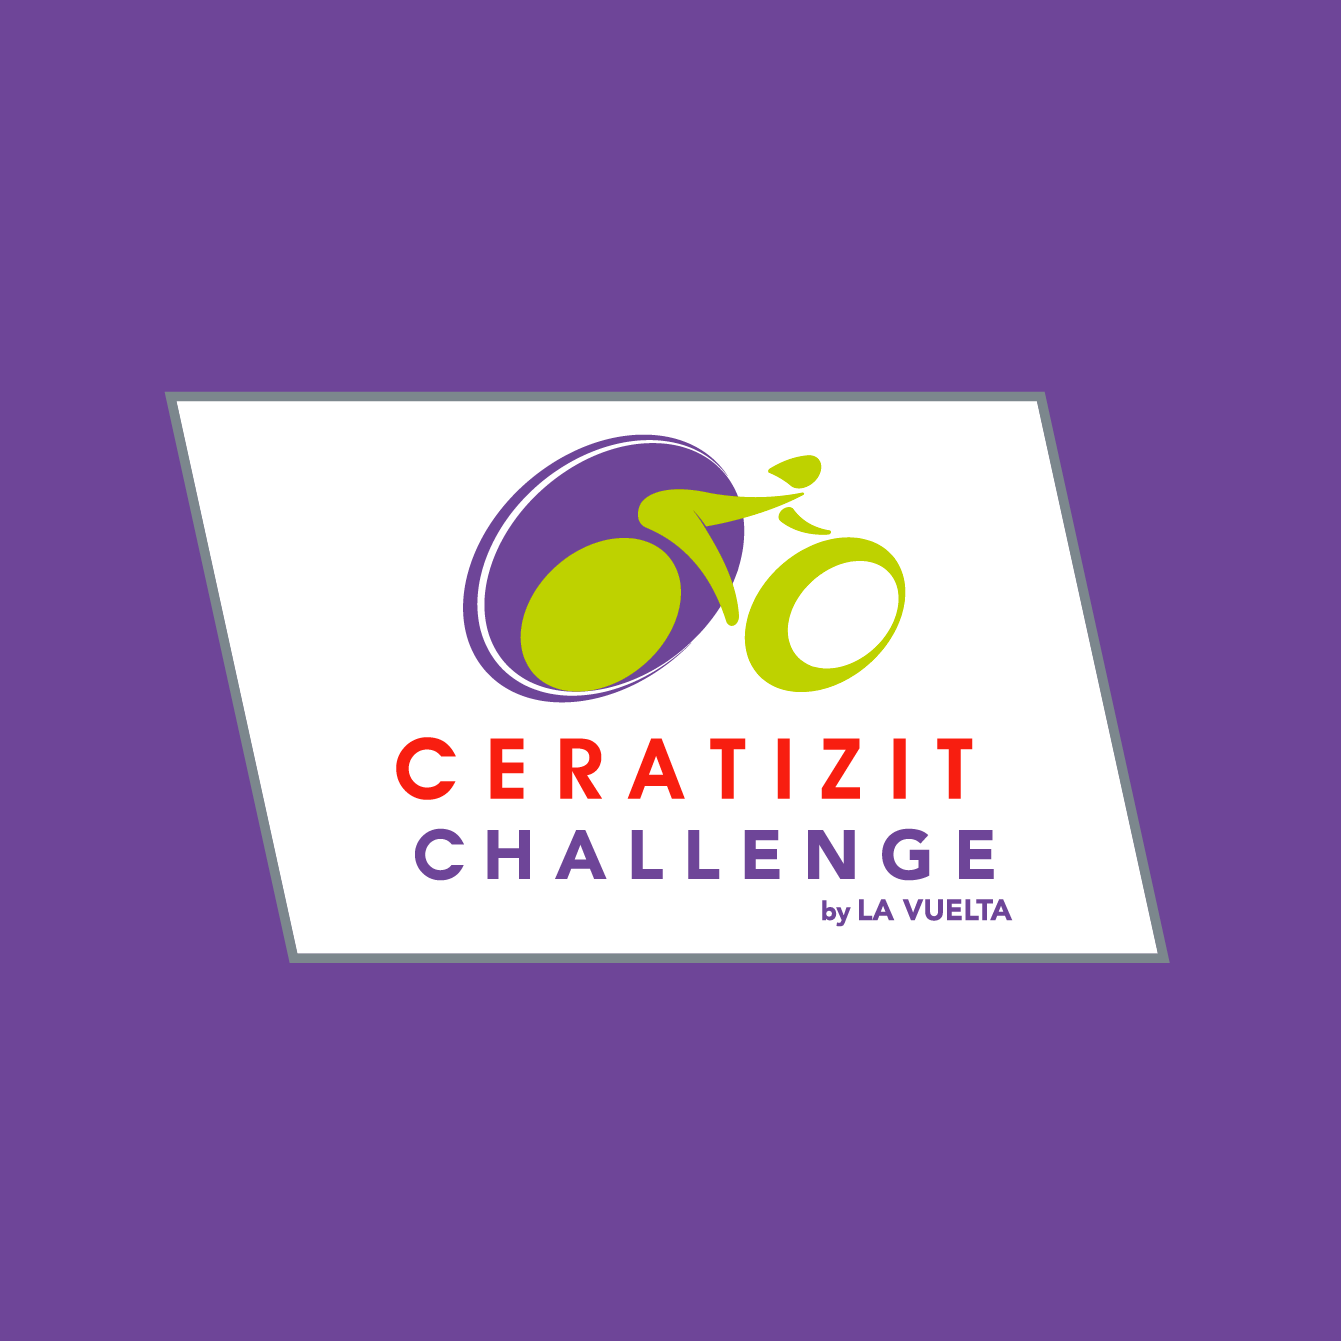 2020 UCI Cycling Women's World Tour - Madrid Challenge by la Vuelta